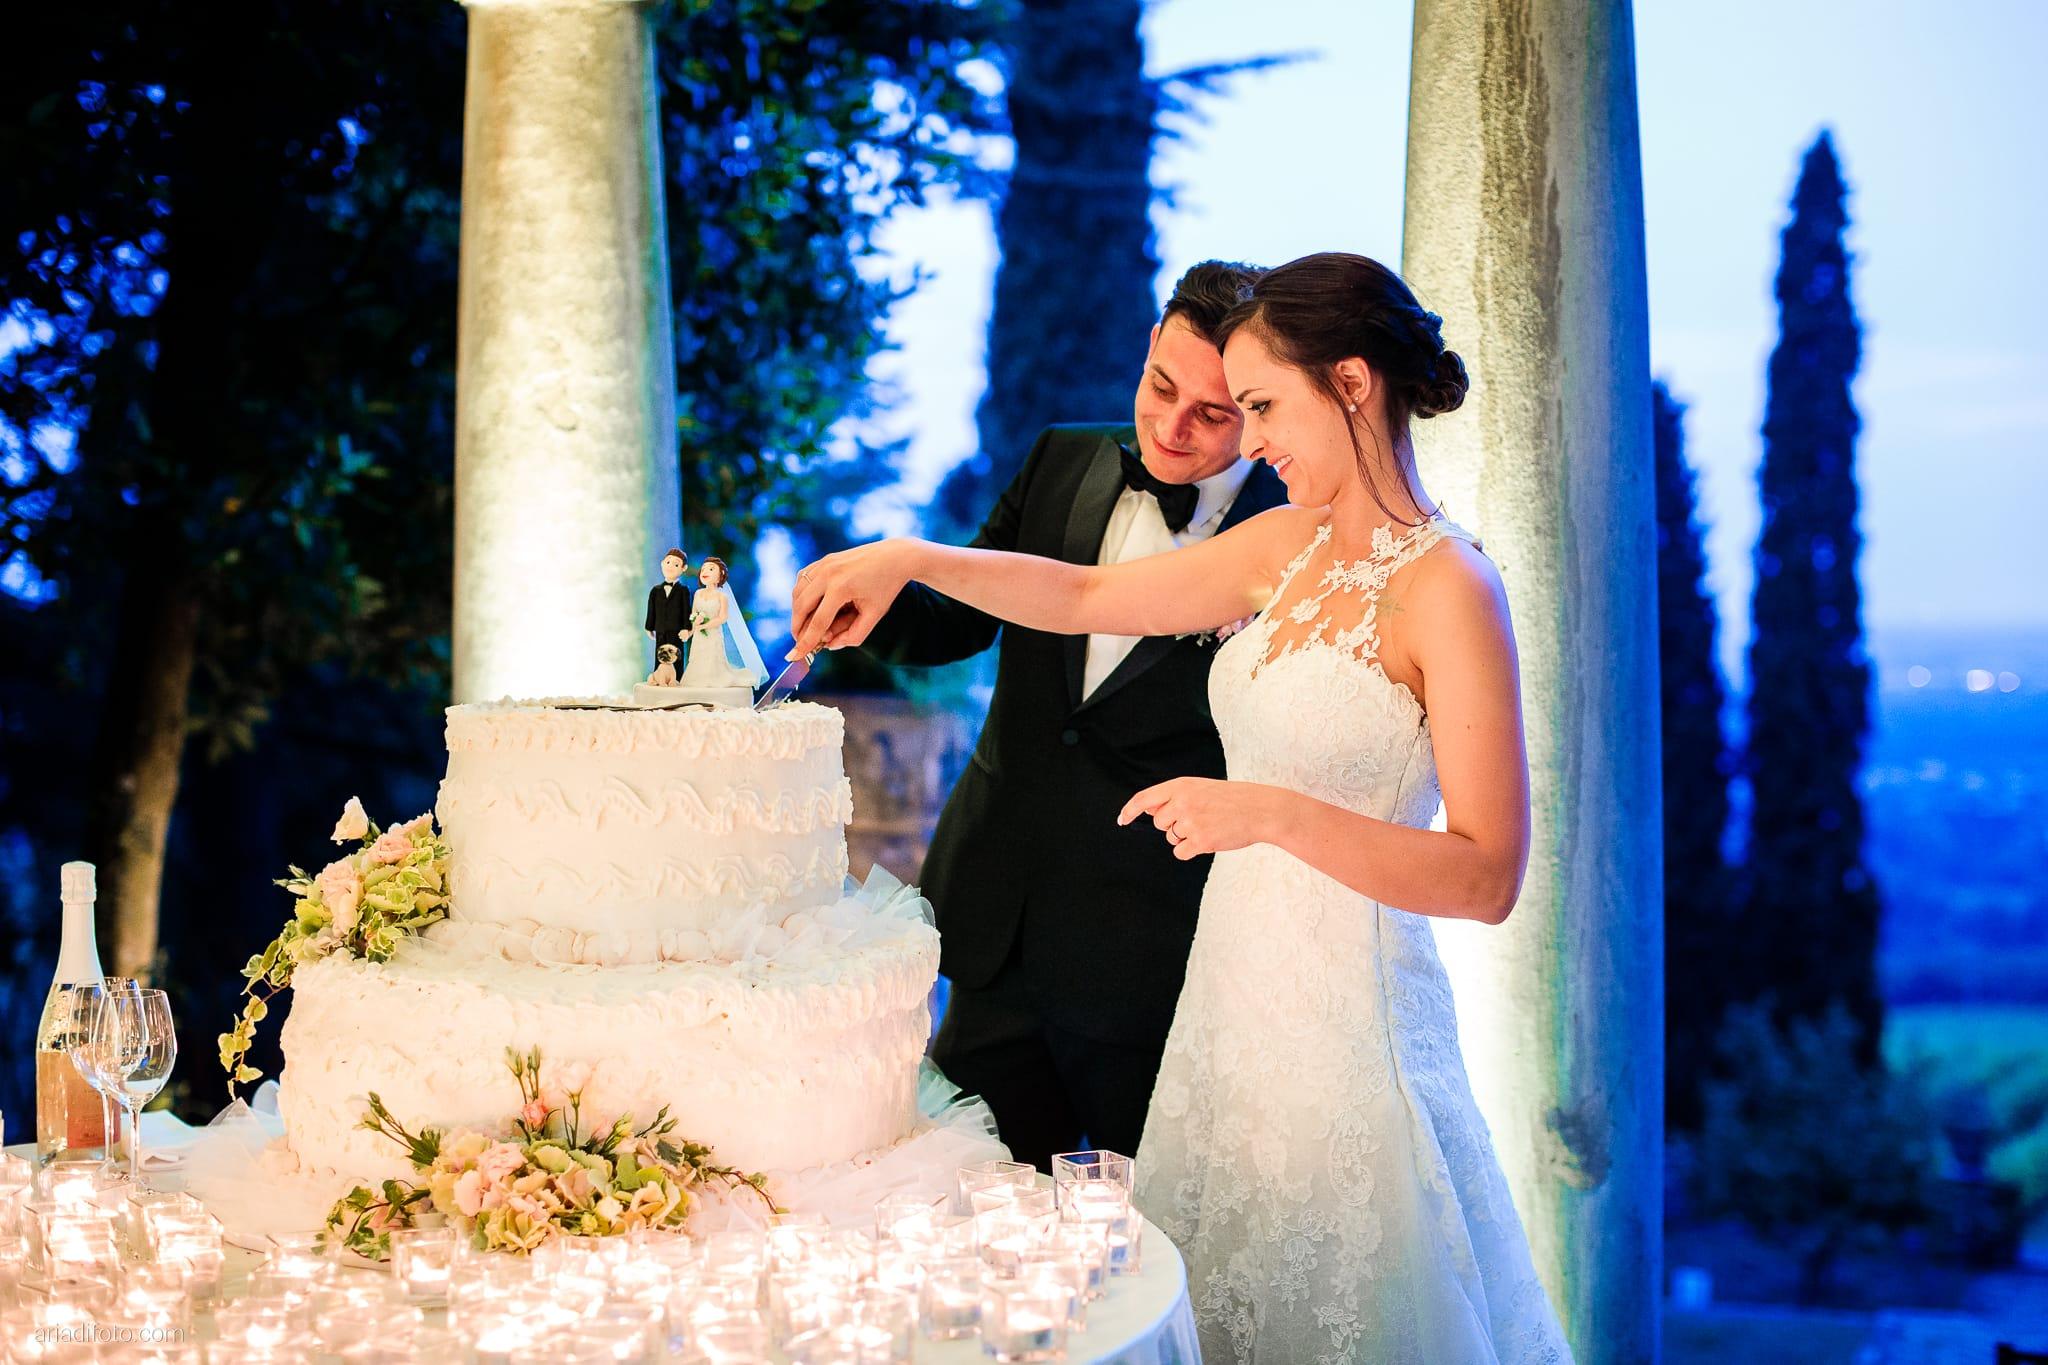 Valentina Marco Matrimonio Duomo Gorizia Castelvecchio Sagrado ricevimento taglio della torta